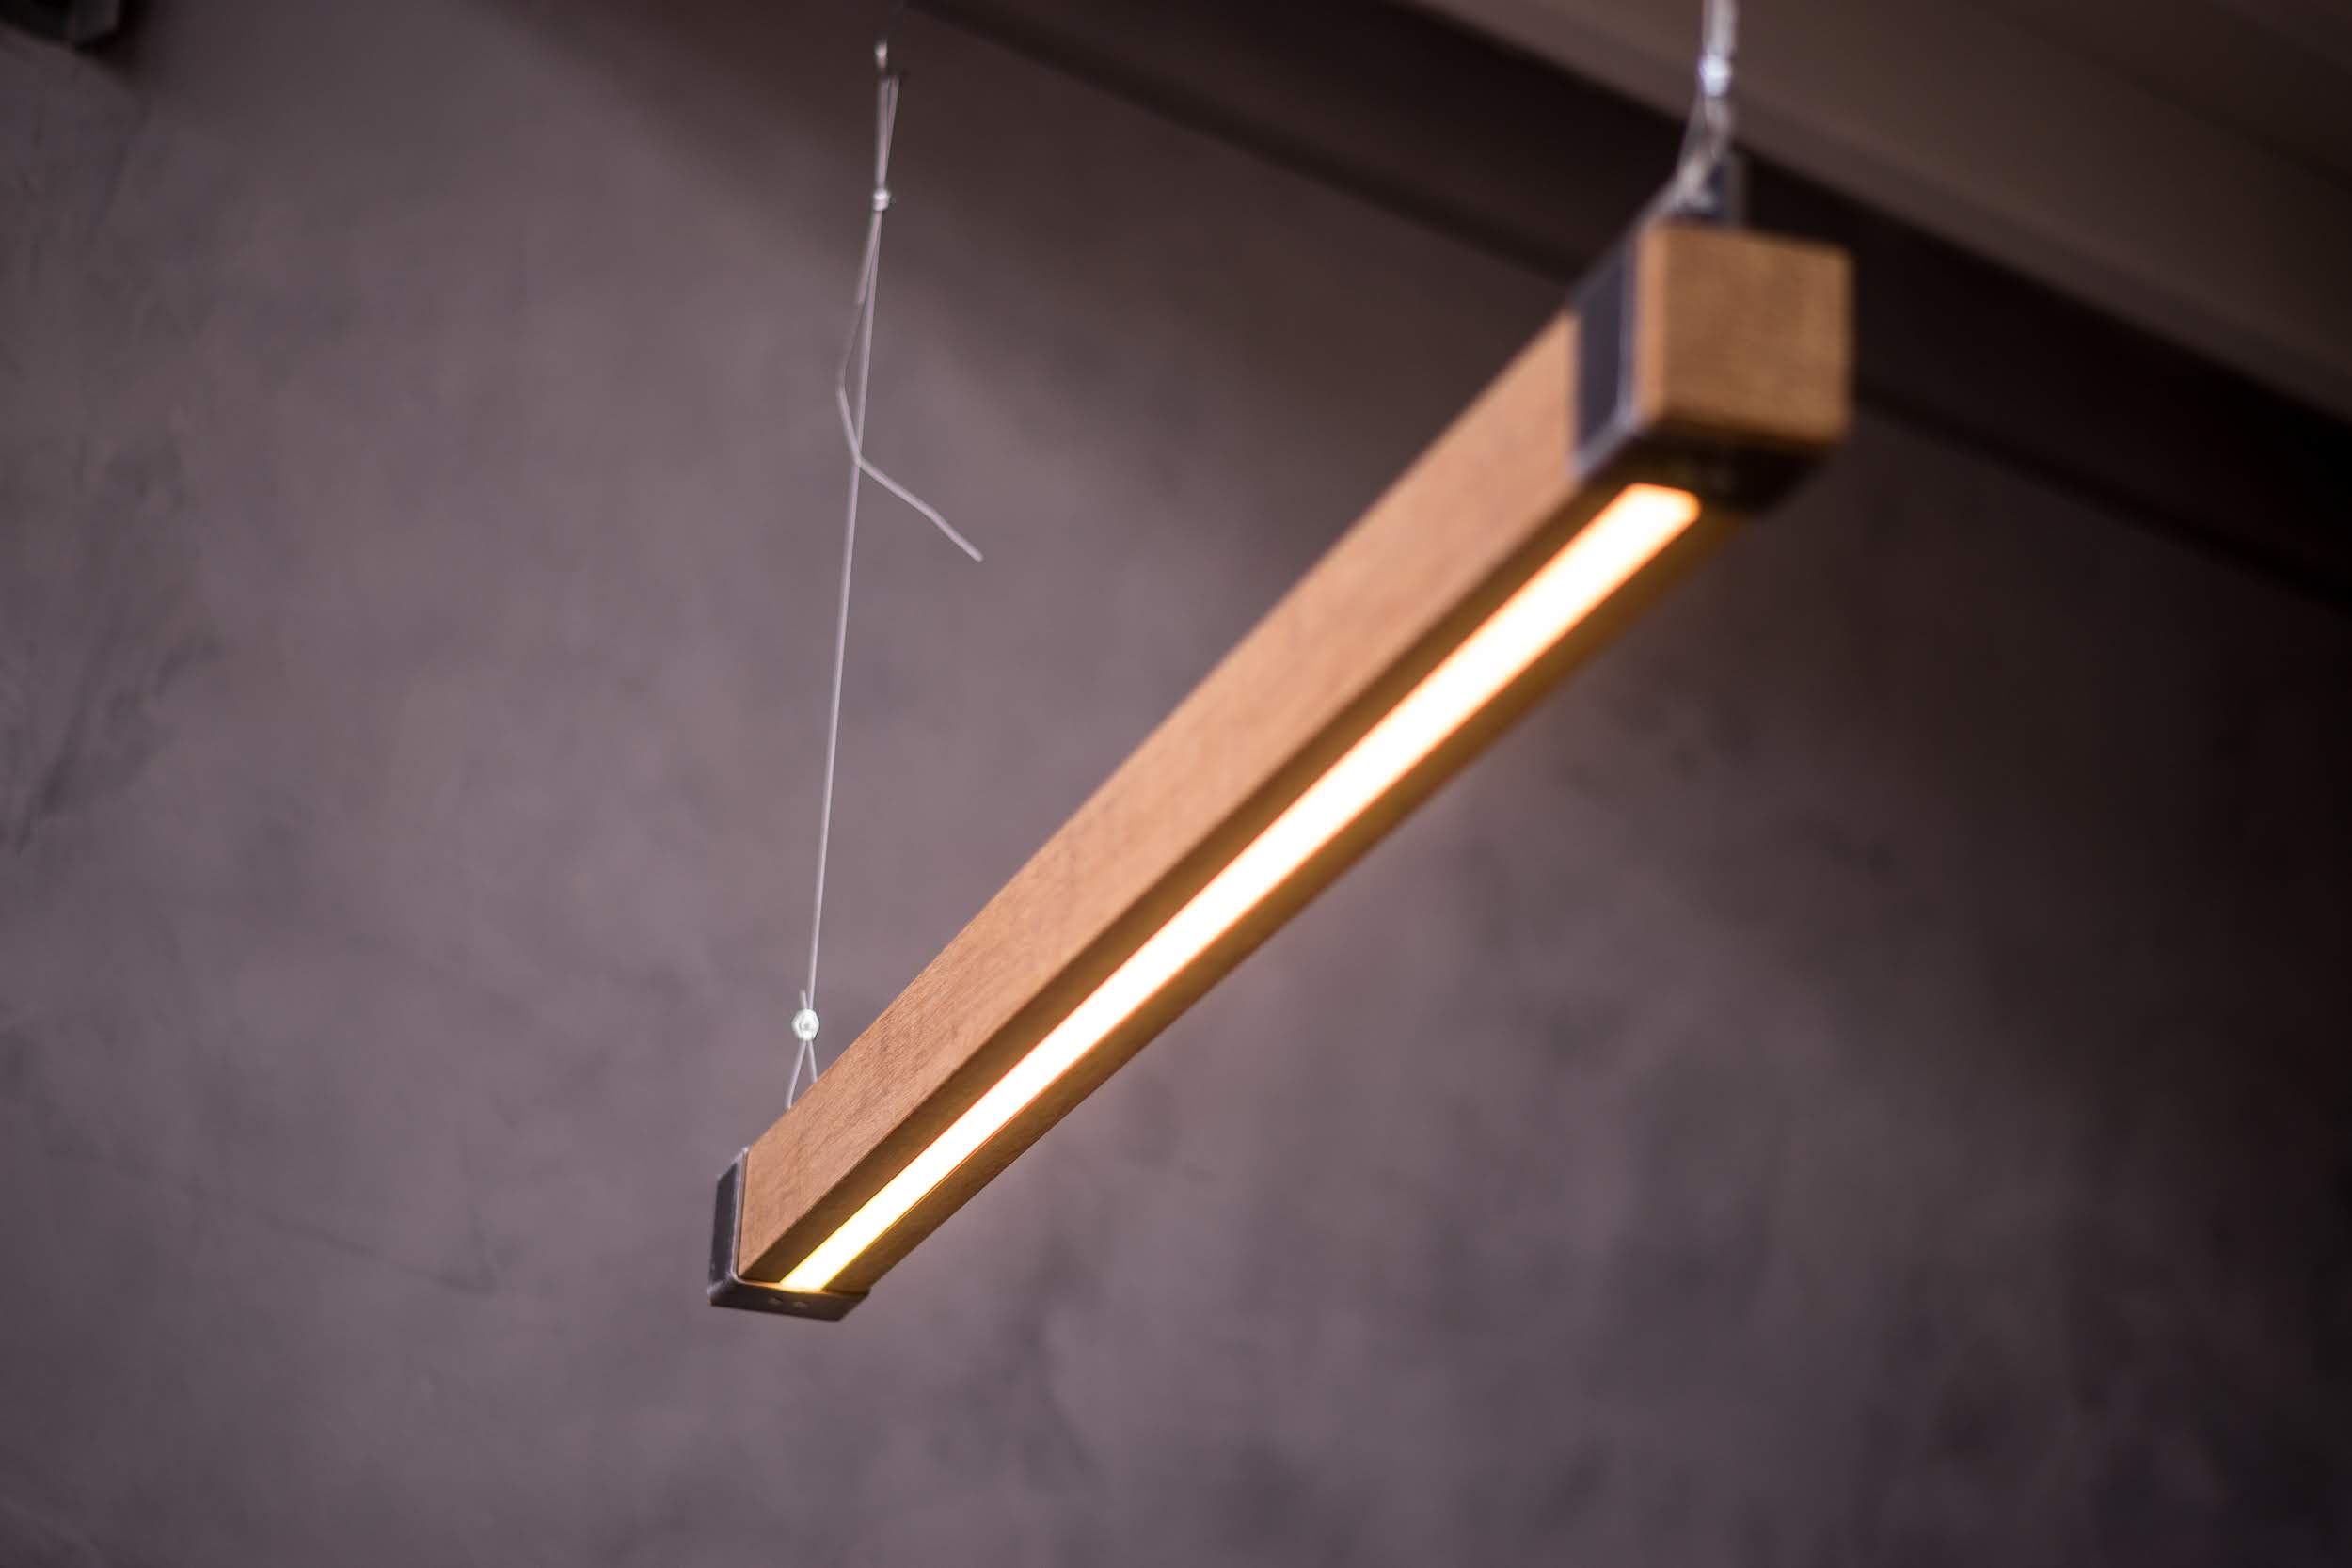 Unieke Balklamp met LED verlichting